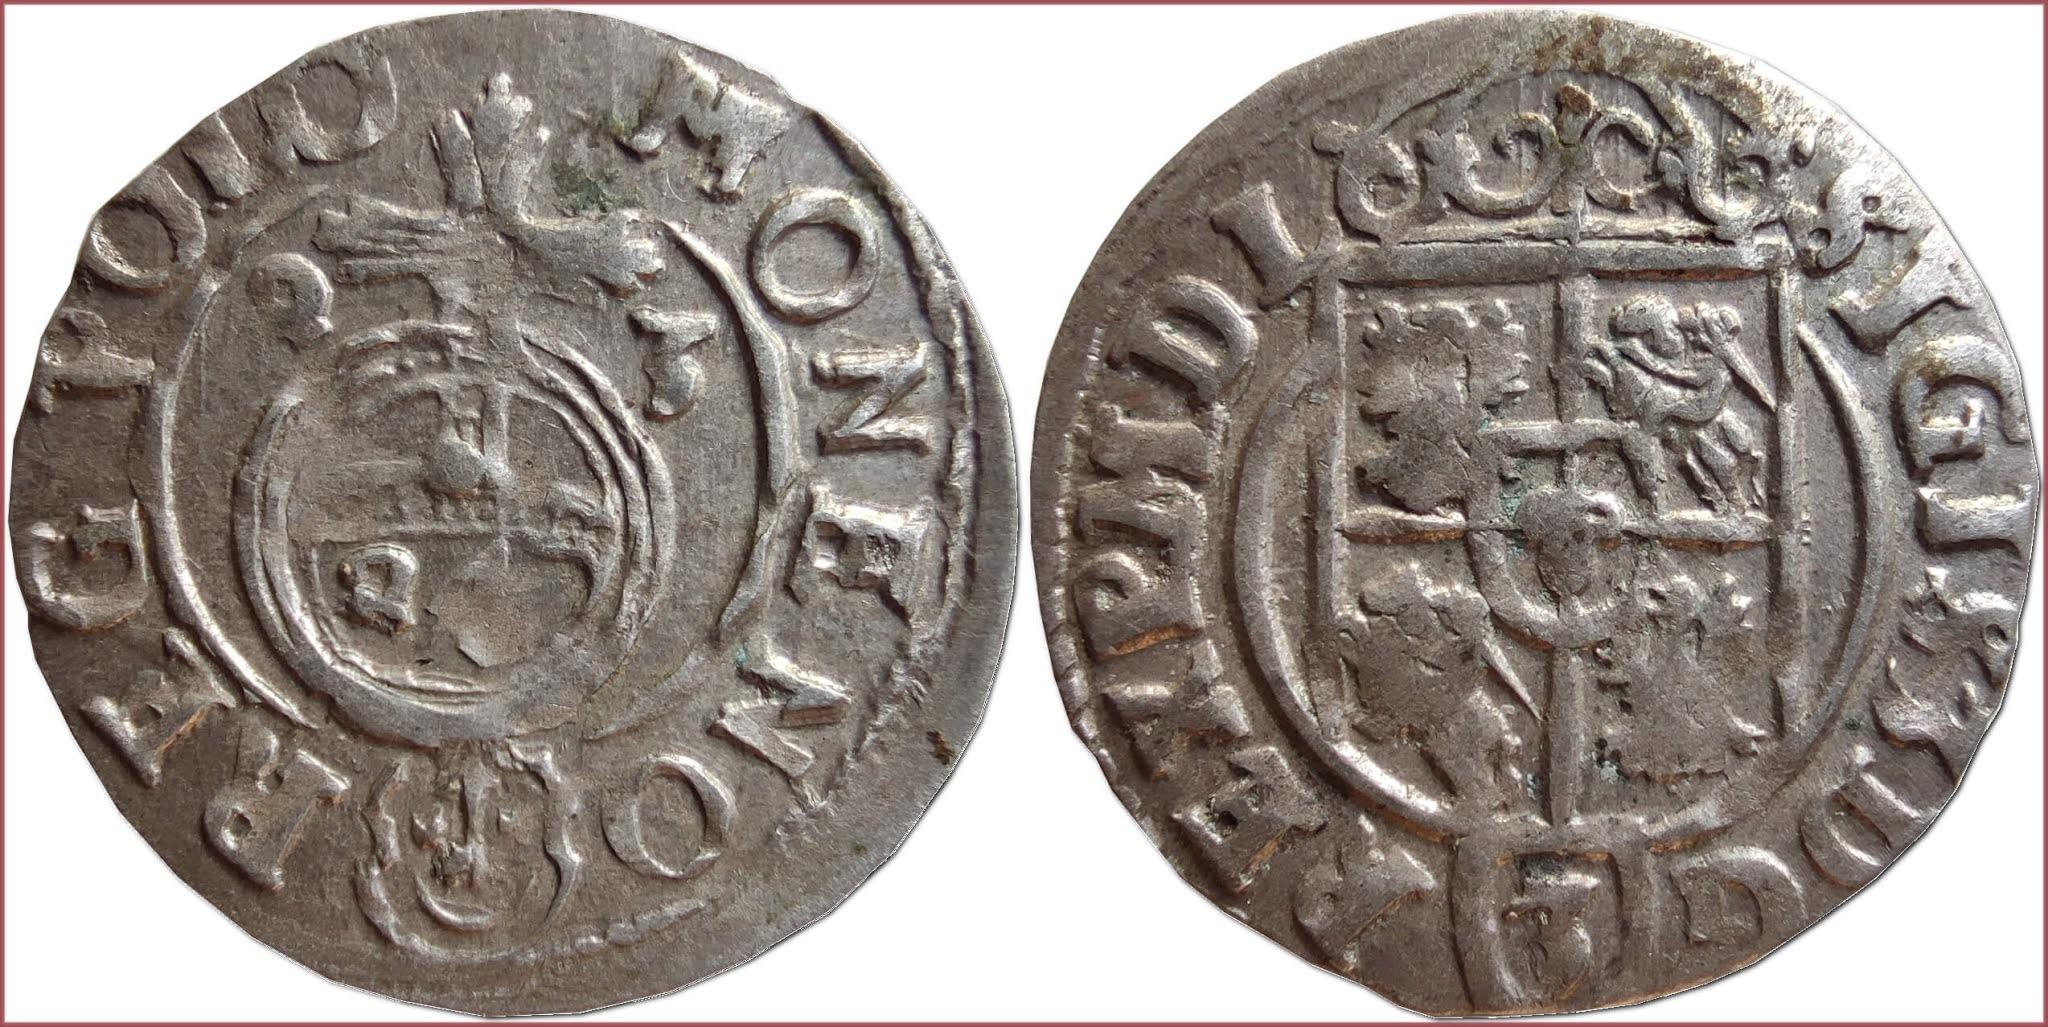 Poltorak (Półtorak), 1623: Polish-Lithuanian Commonwealth